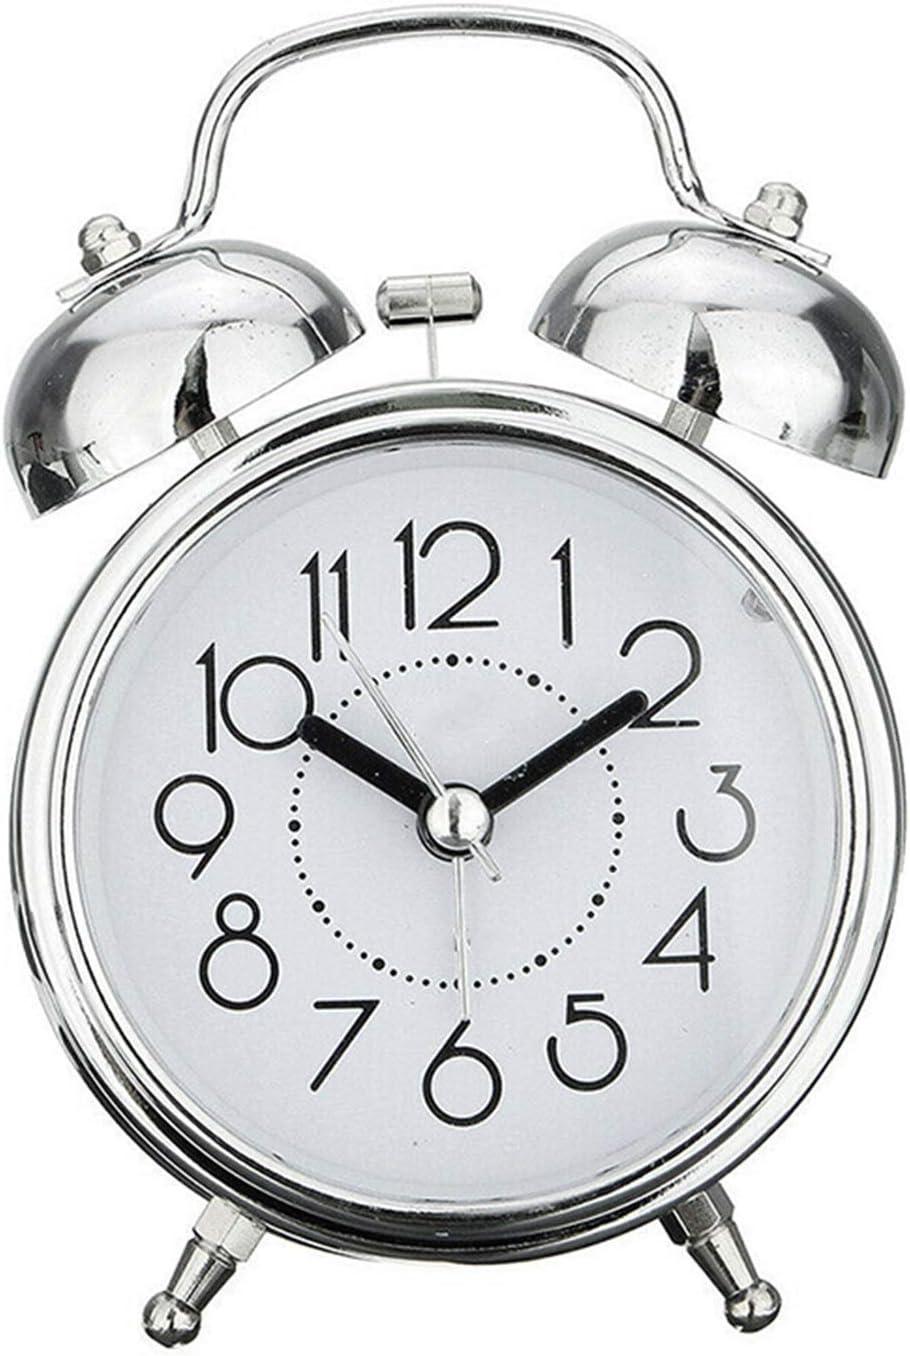 FIRMLEILEI Creativo Retro Despertador Reloj de Bronce Antiguo Reloj Redondo Dual Campana Fuerte Reloj de Alarma Noche luz de Noche Decoraciones de hogar Regalo Despertador (Color : S)